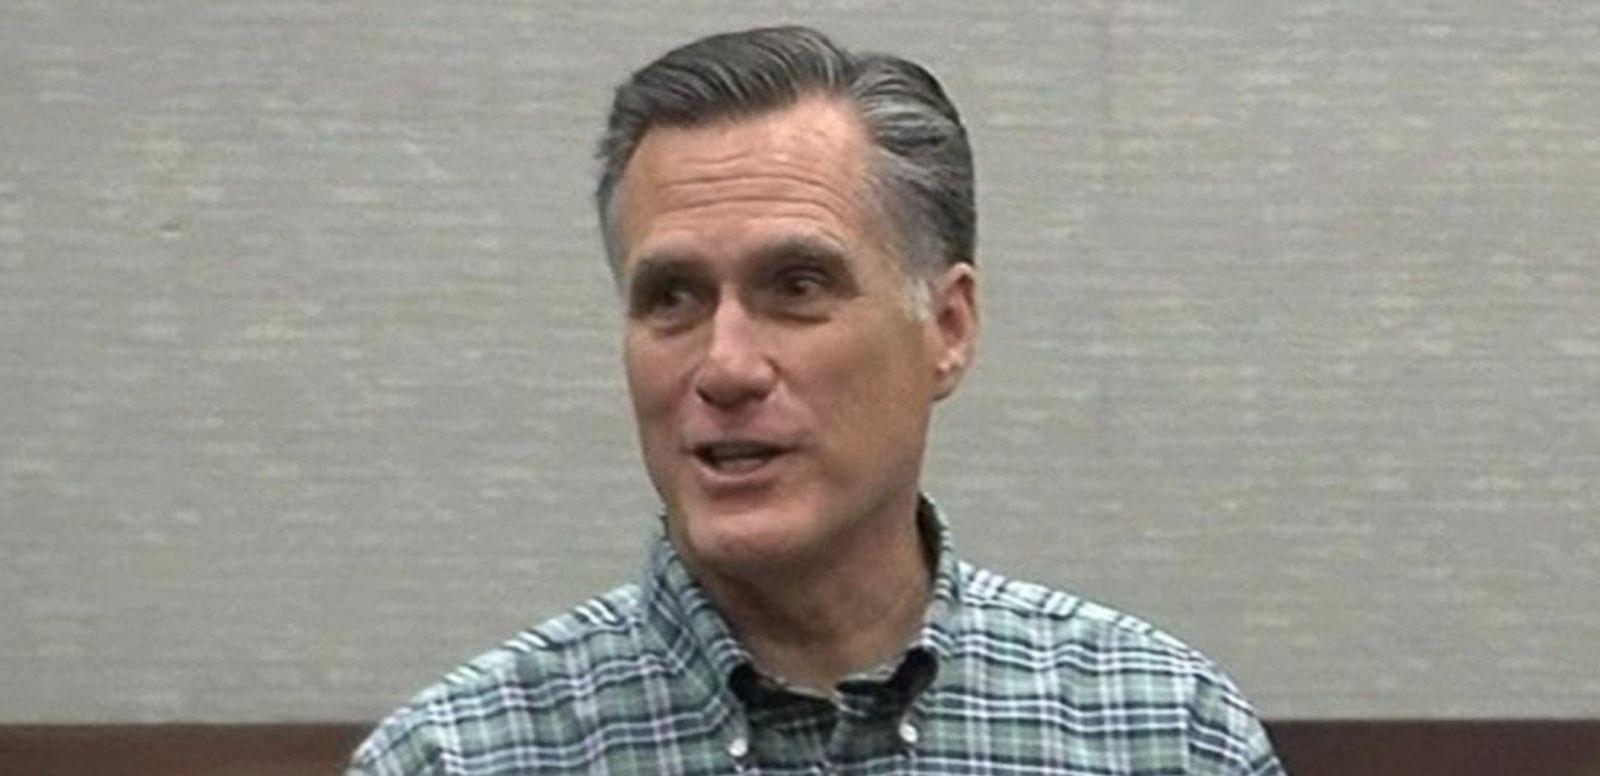 VIDEO: Mitt Romney 2016 Decision Shakes Up GOP Presidential Race